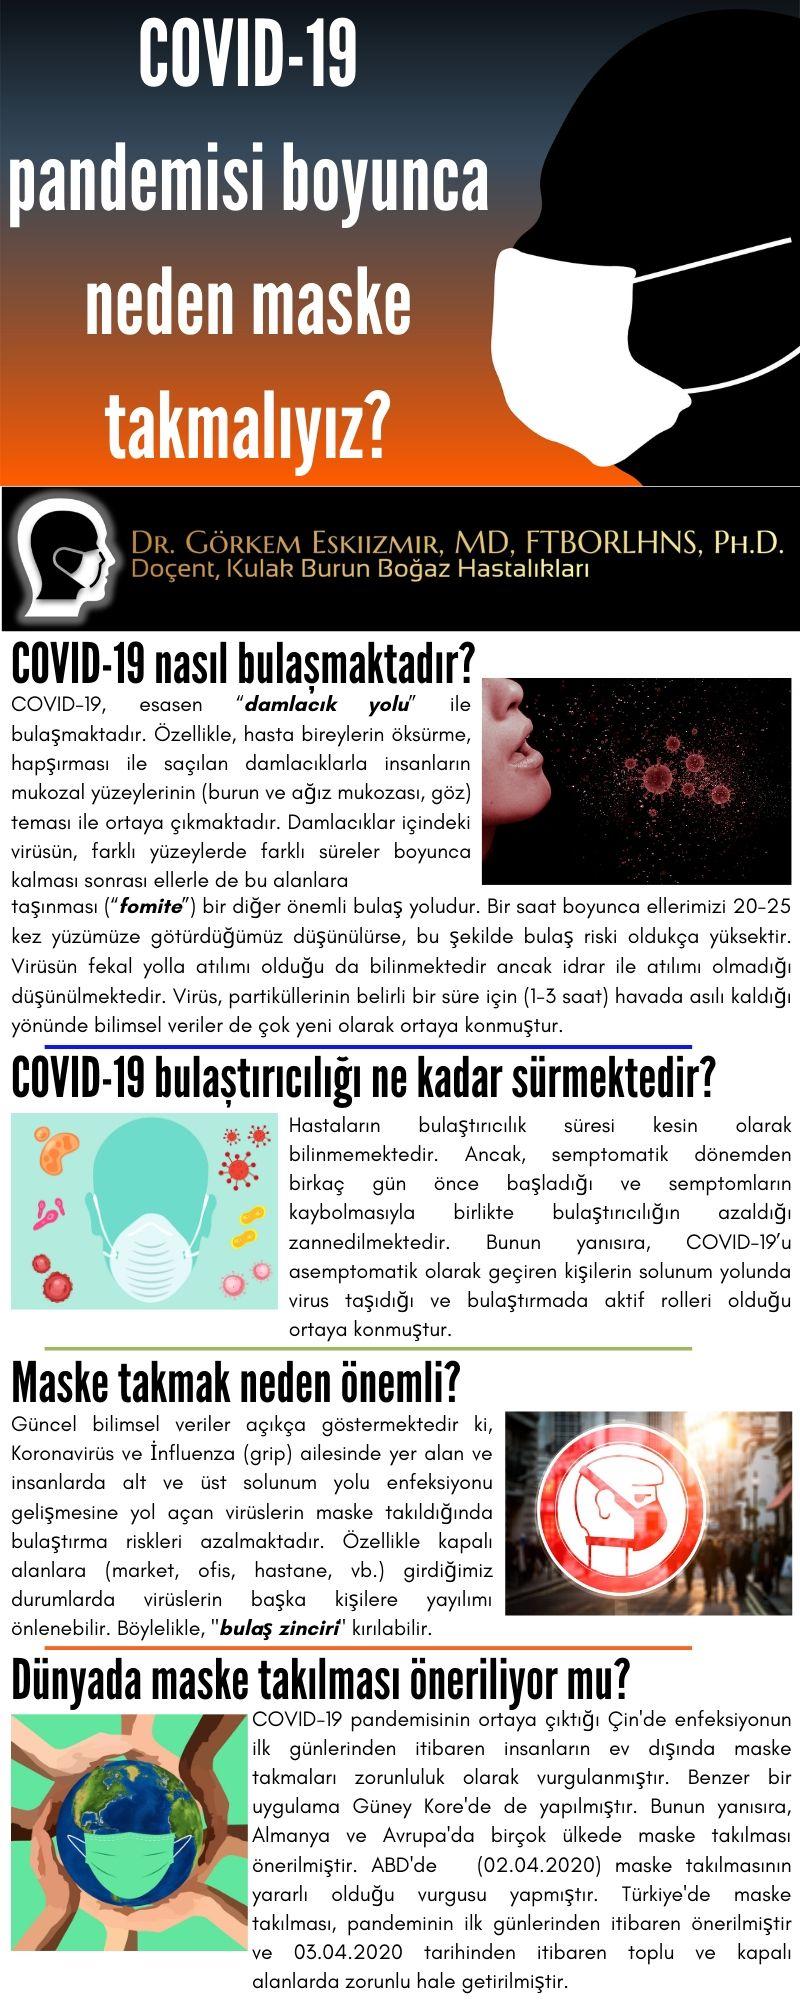 Covid-19 pandemisinde neden maske takmalıyız?